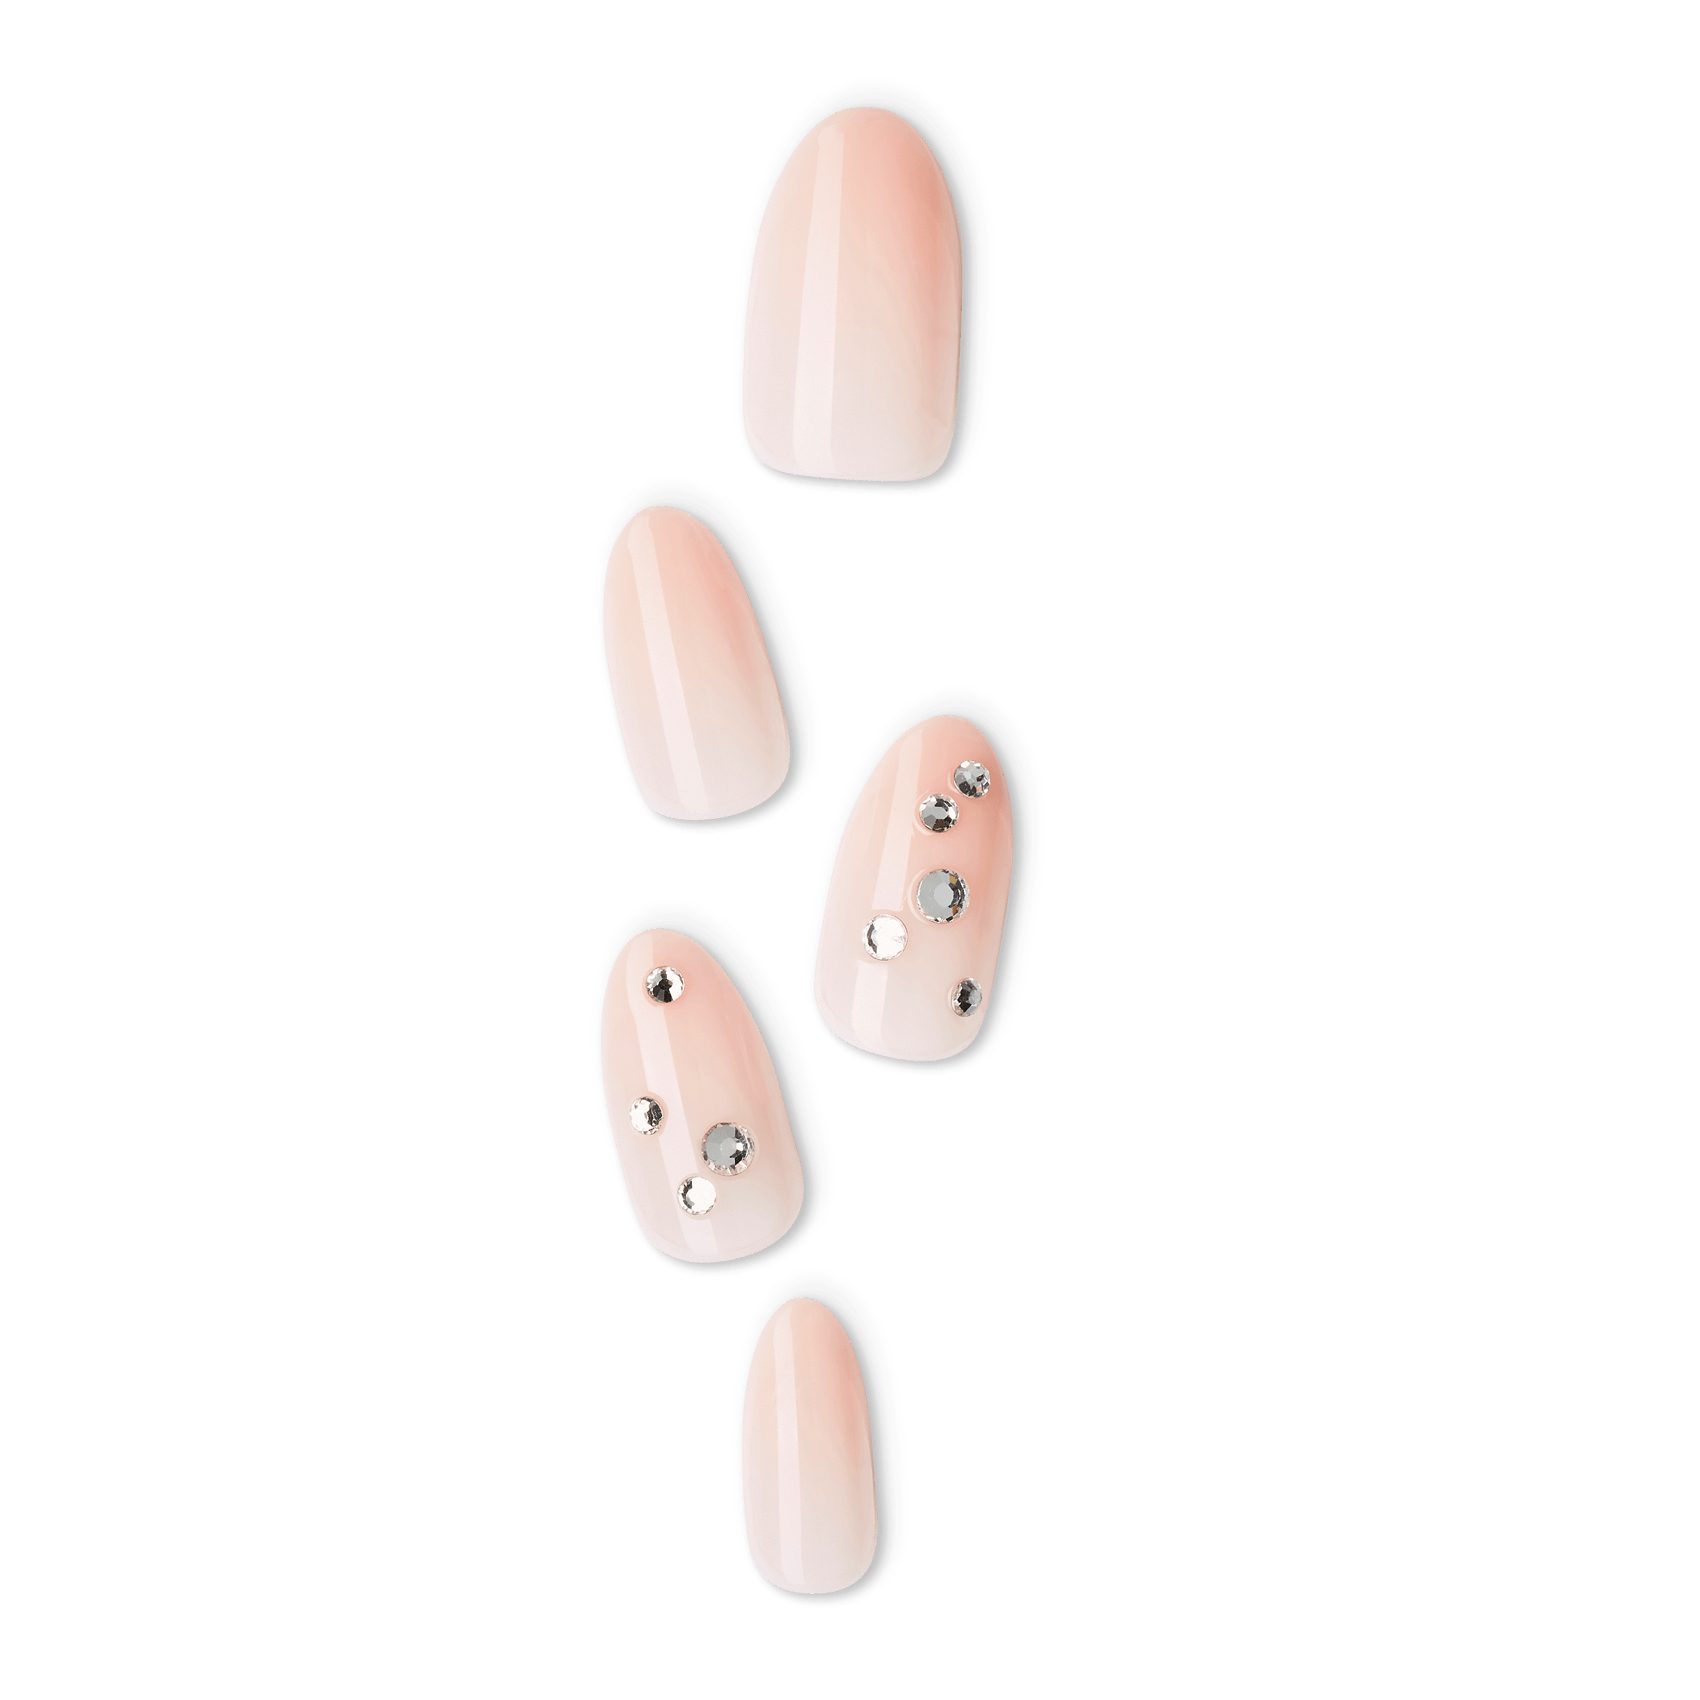 Rebecca Minkoff X imPRESS Press-on Manicure - Skinny Dipping